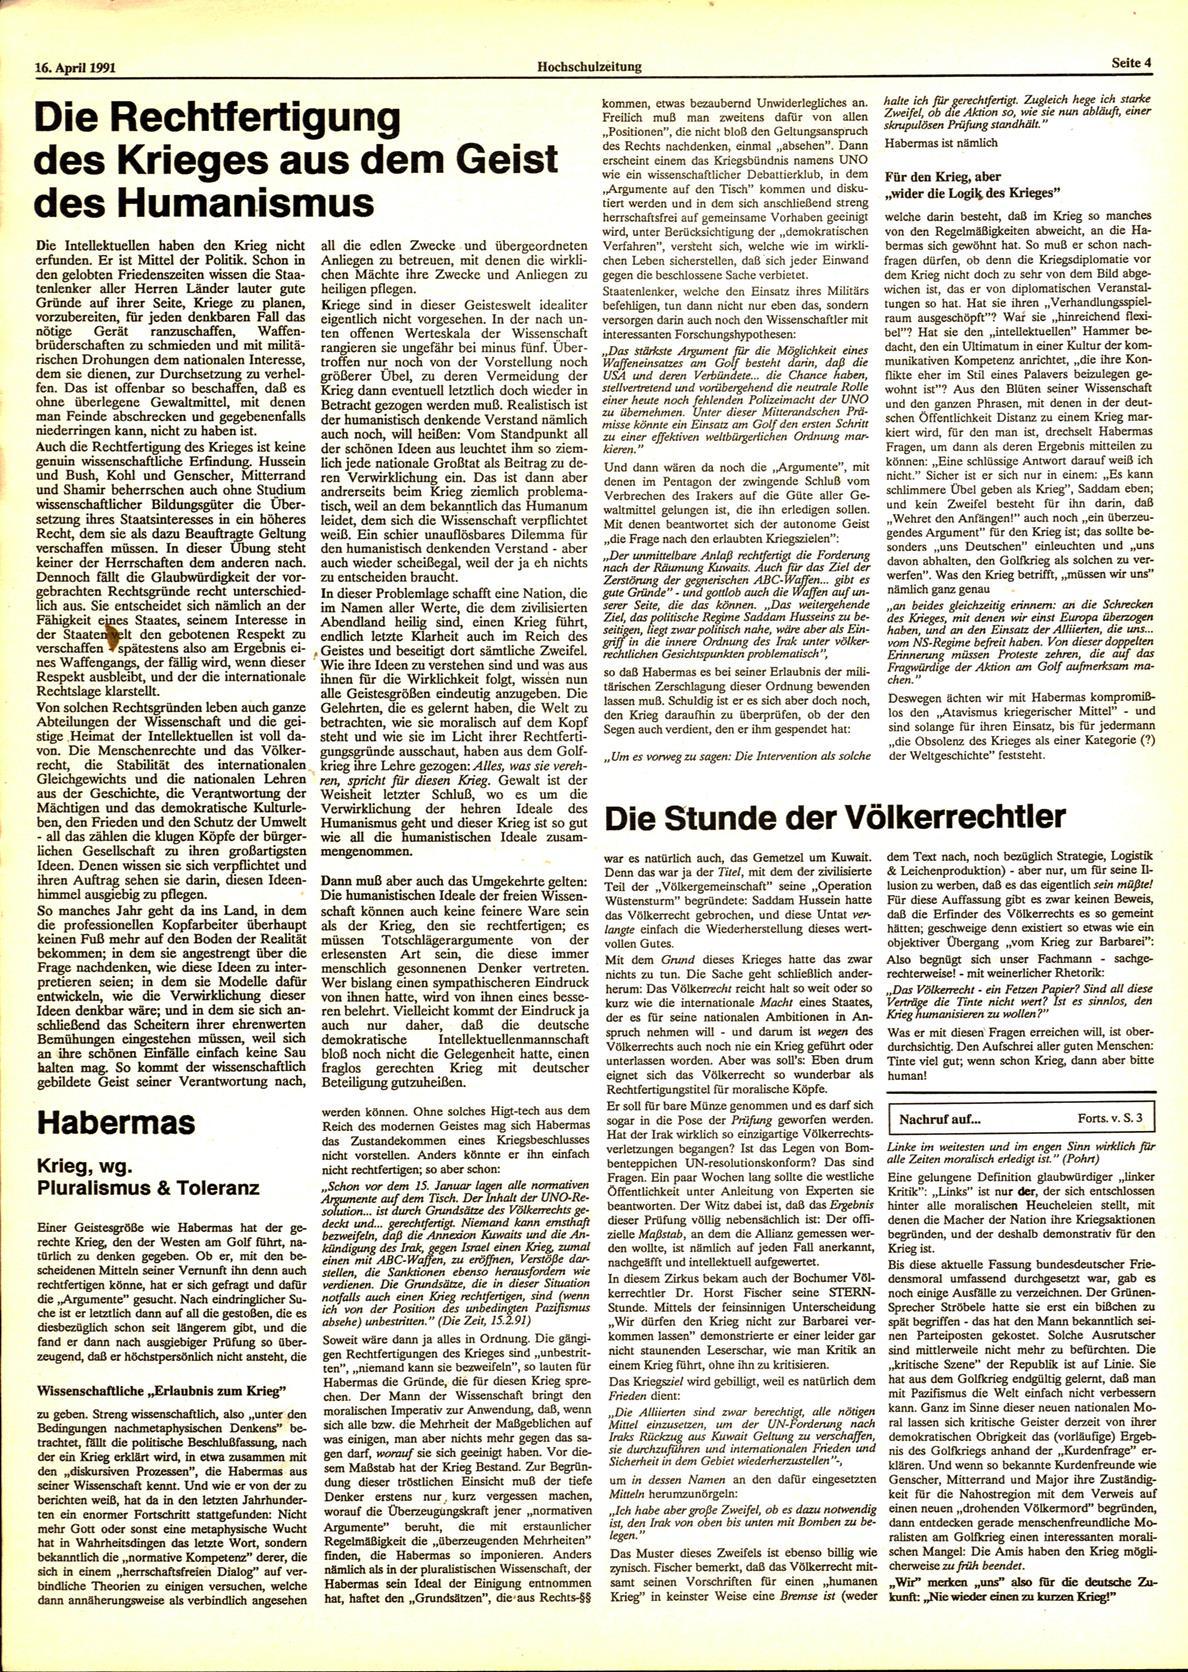 Bochum_BHZ_19910416_004